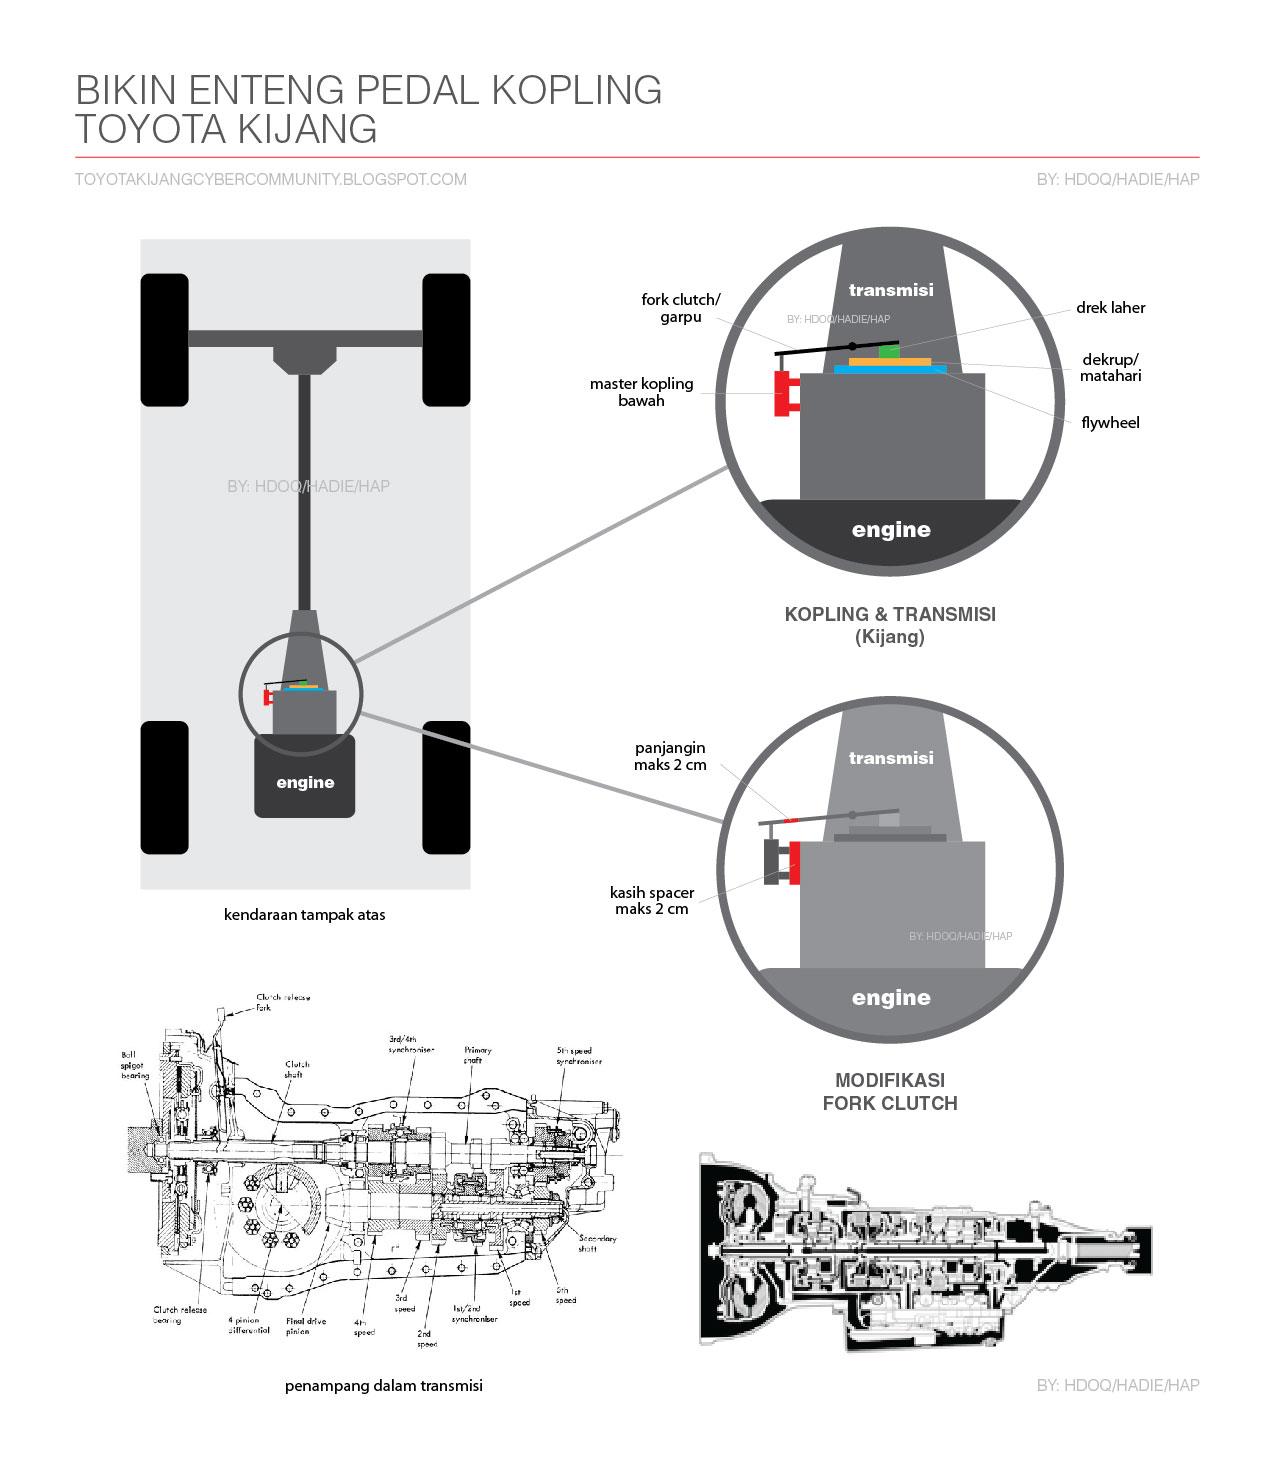 Wiring Diagram Toyota Kijang 5k Bmw Mini Cooper 7k Engine Number